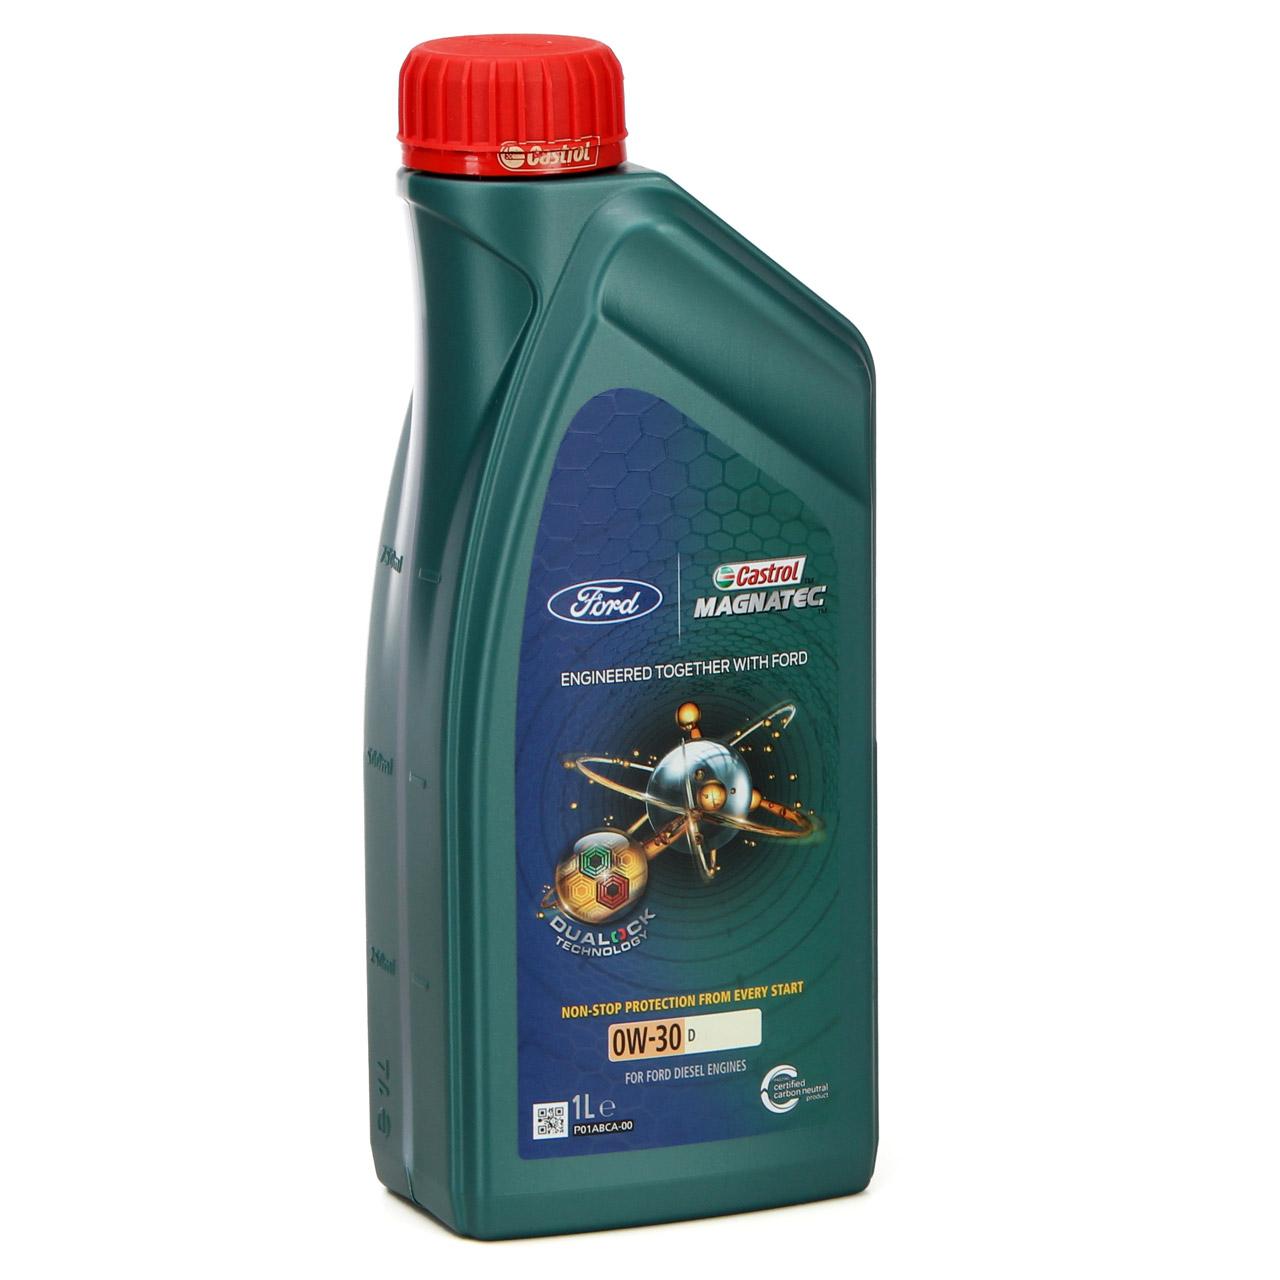 ORIGINAL Ford CASTROL Motoröl Öl D 0W30 Magnatec Professional 1 Liter 1 L 157C36